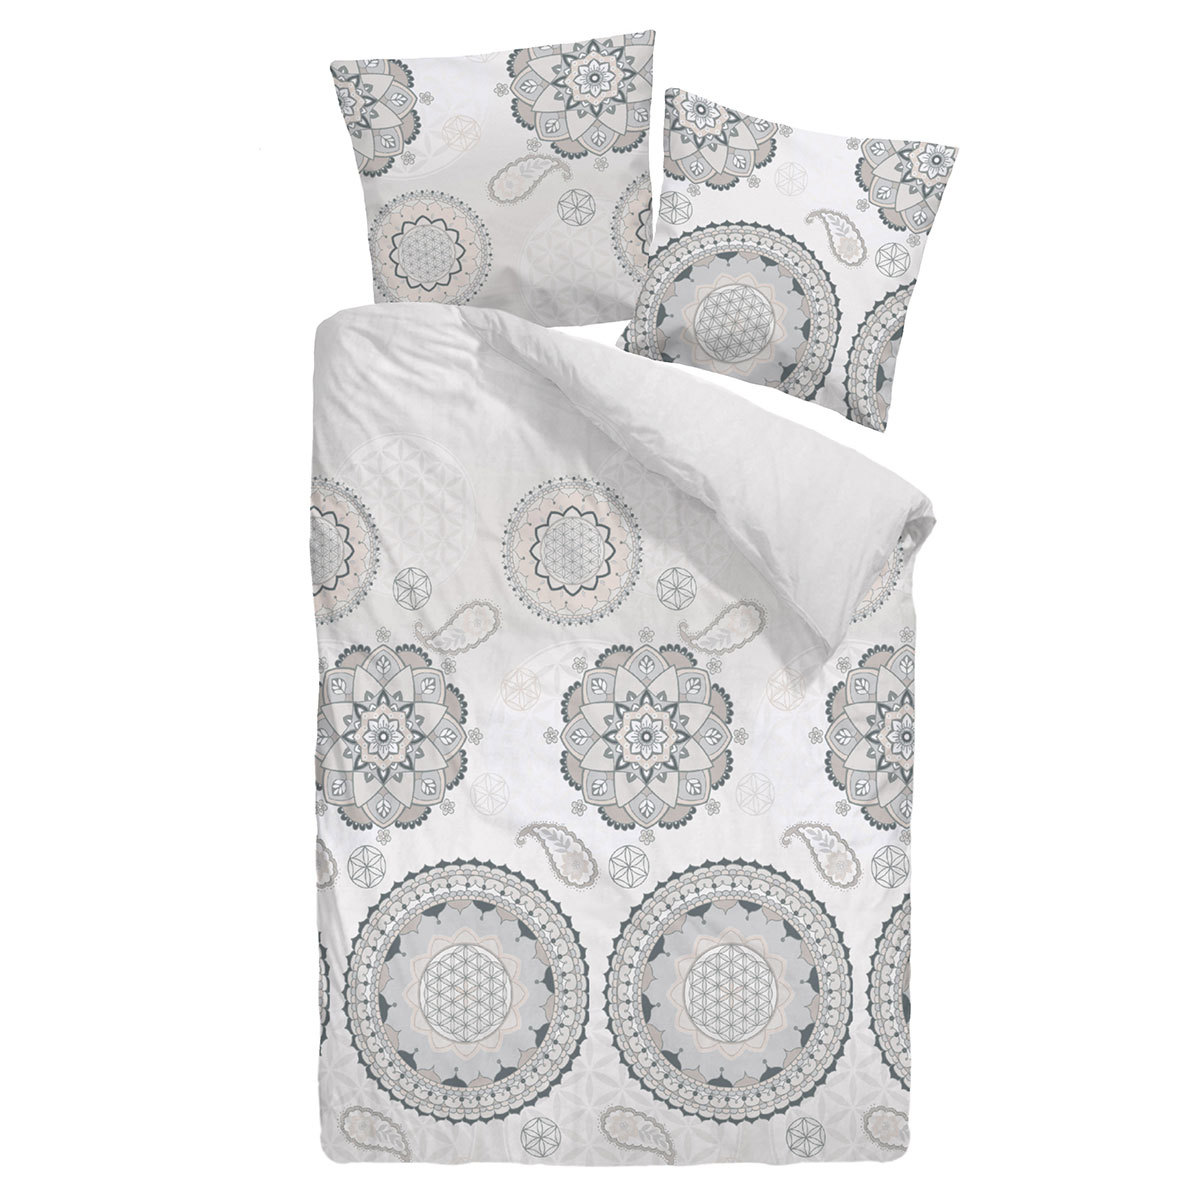 dormisette mako satin bettw sche ornamente g nstig online. Black Bedroom Furniture Sets. Home Design Ideas